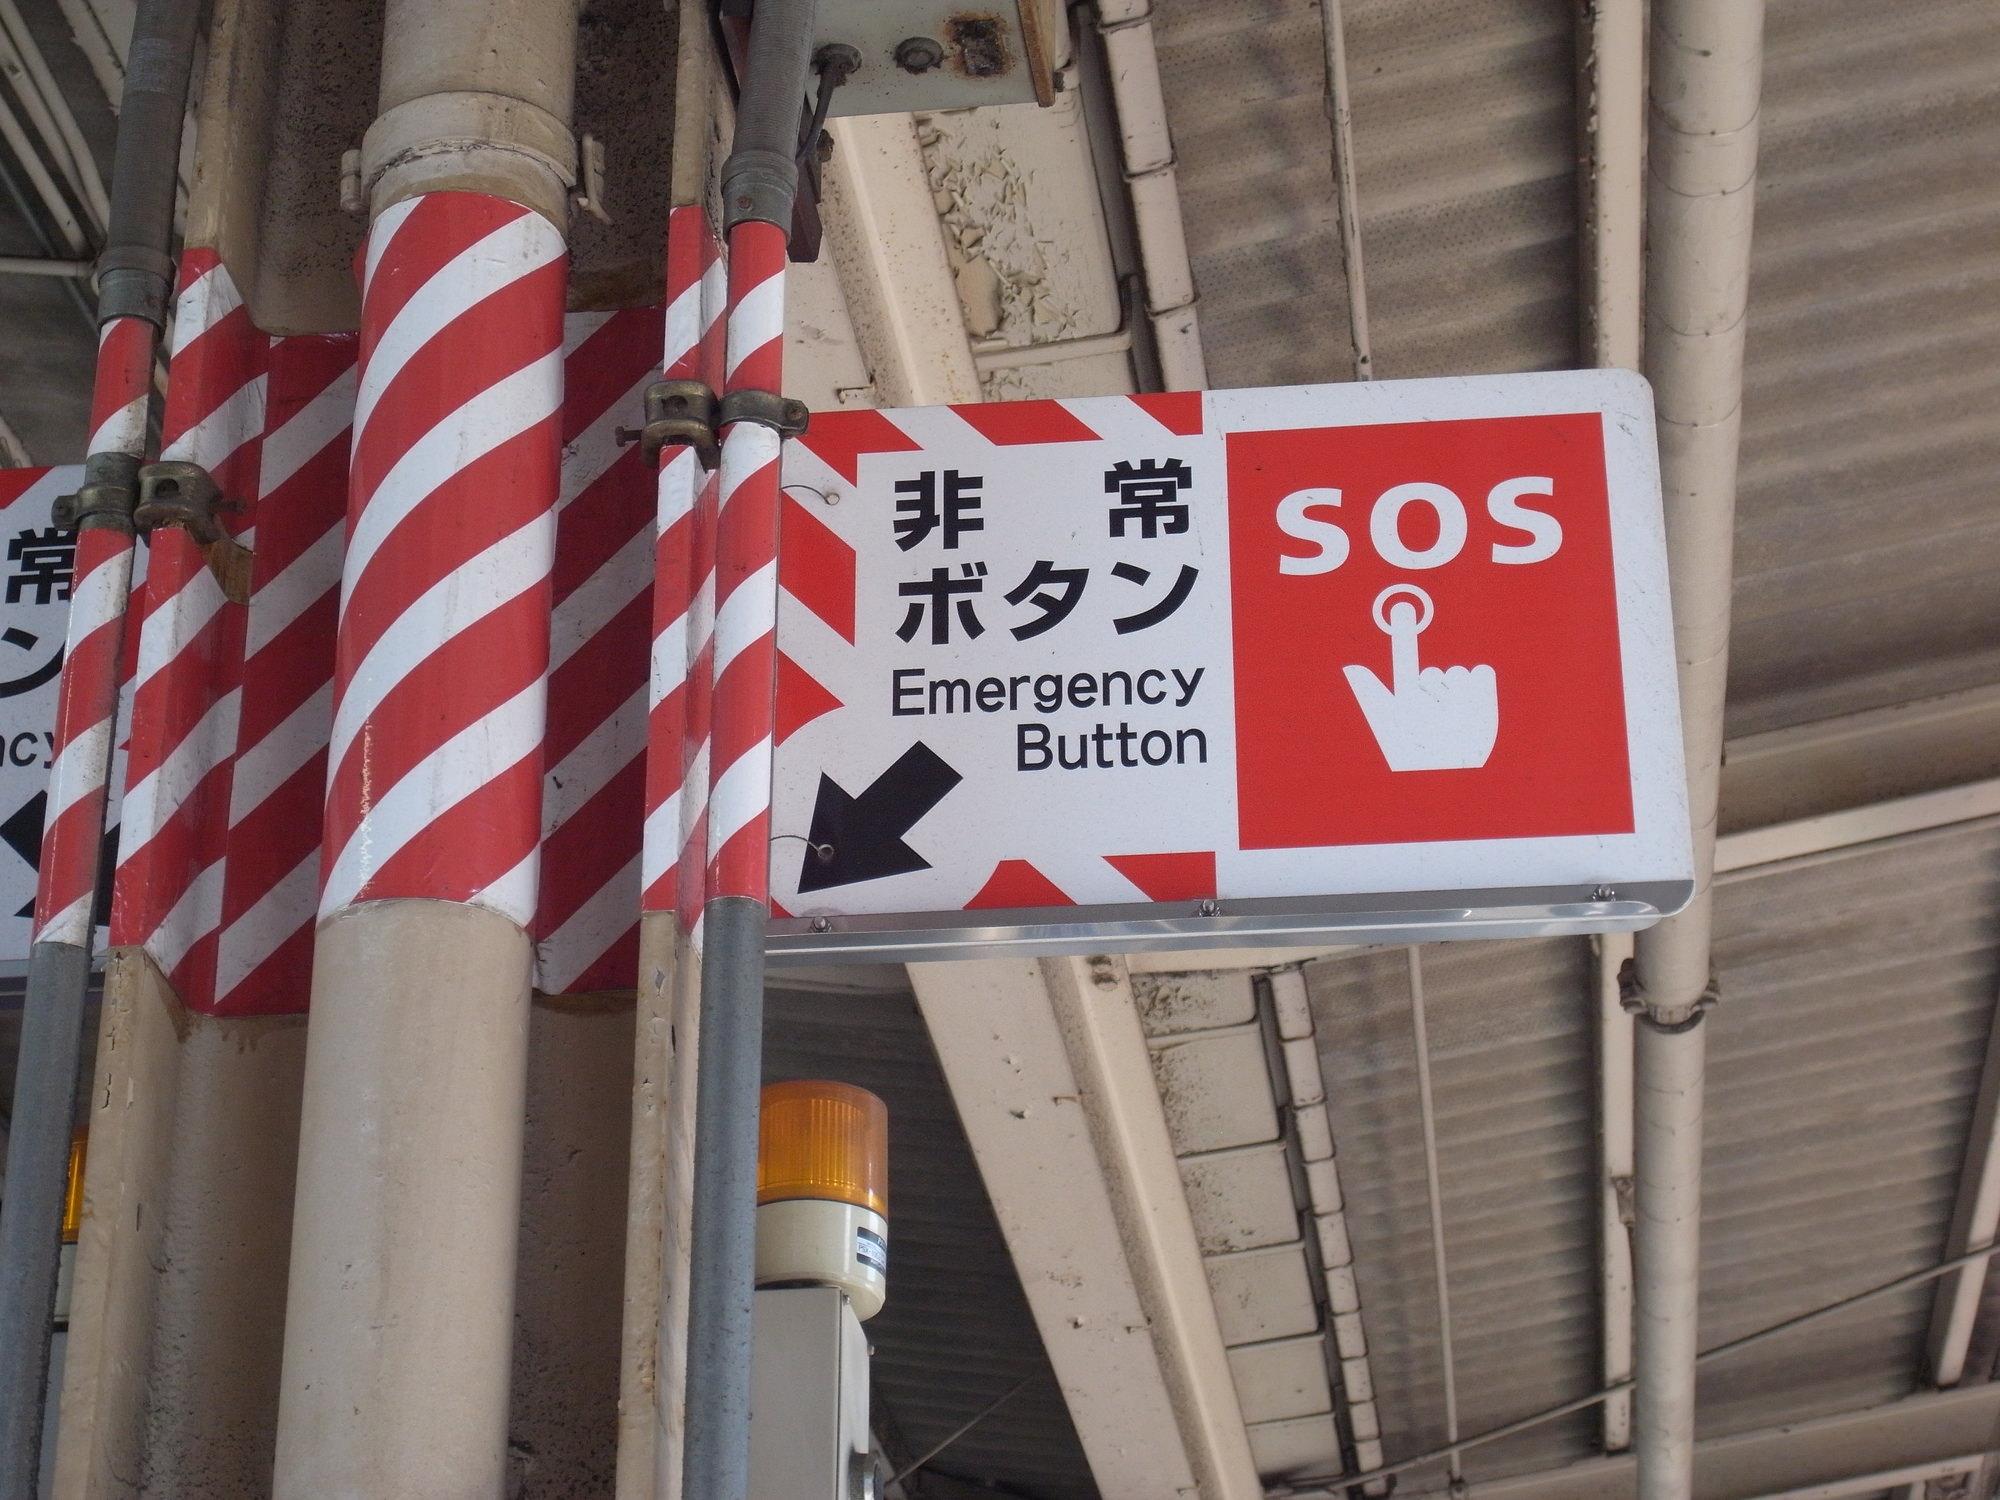 SOSという言葉に意味がない